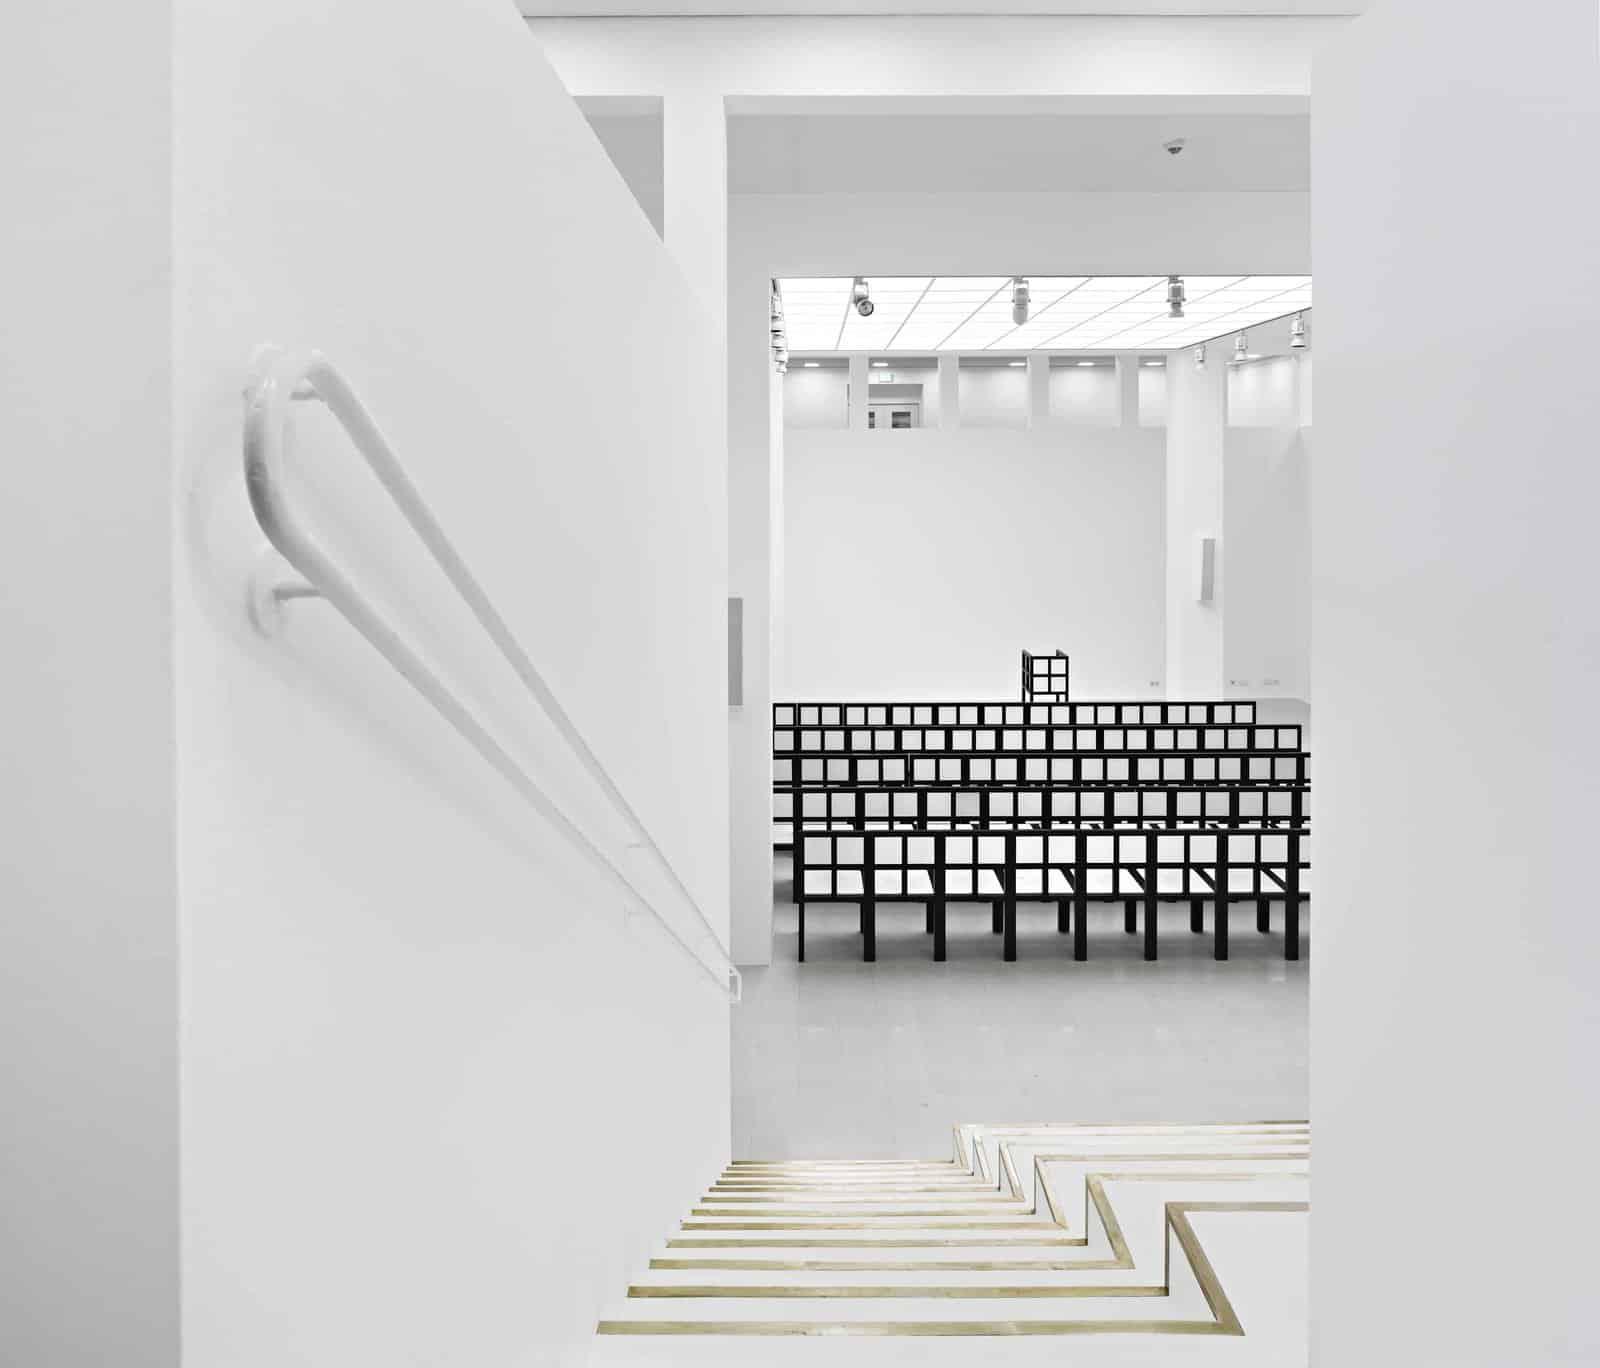 Blick ins Auditorium  Foto: Norbert Miguletz, Frankfurt am Main